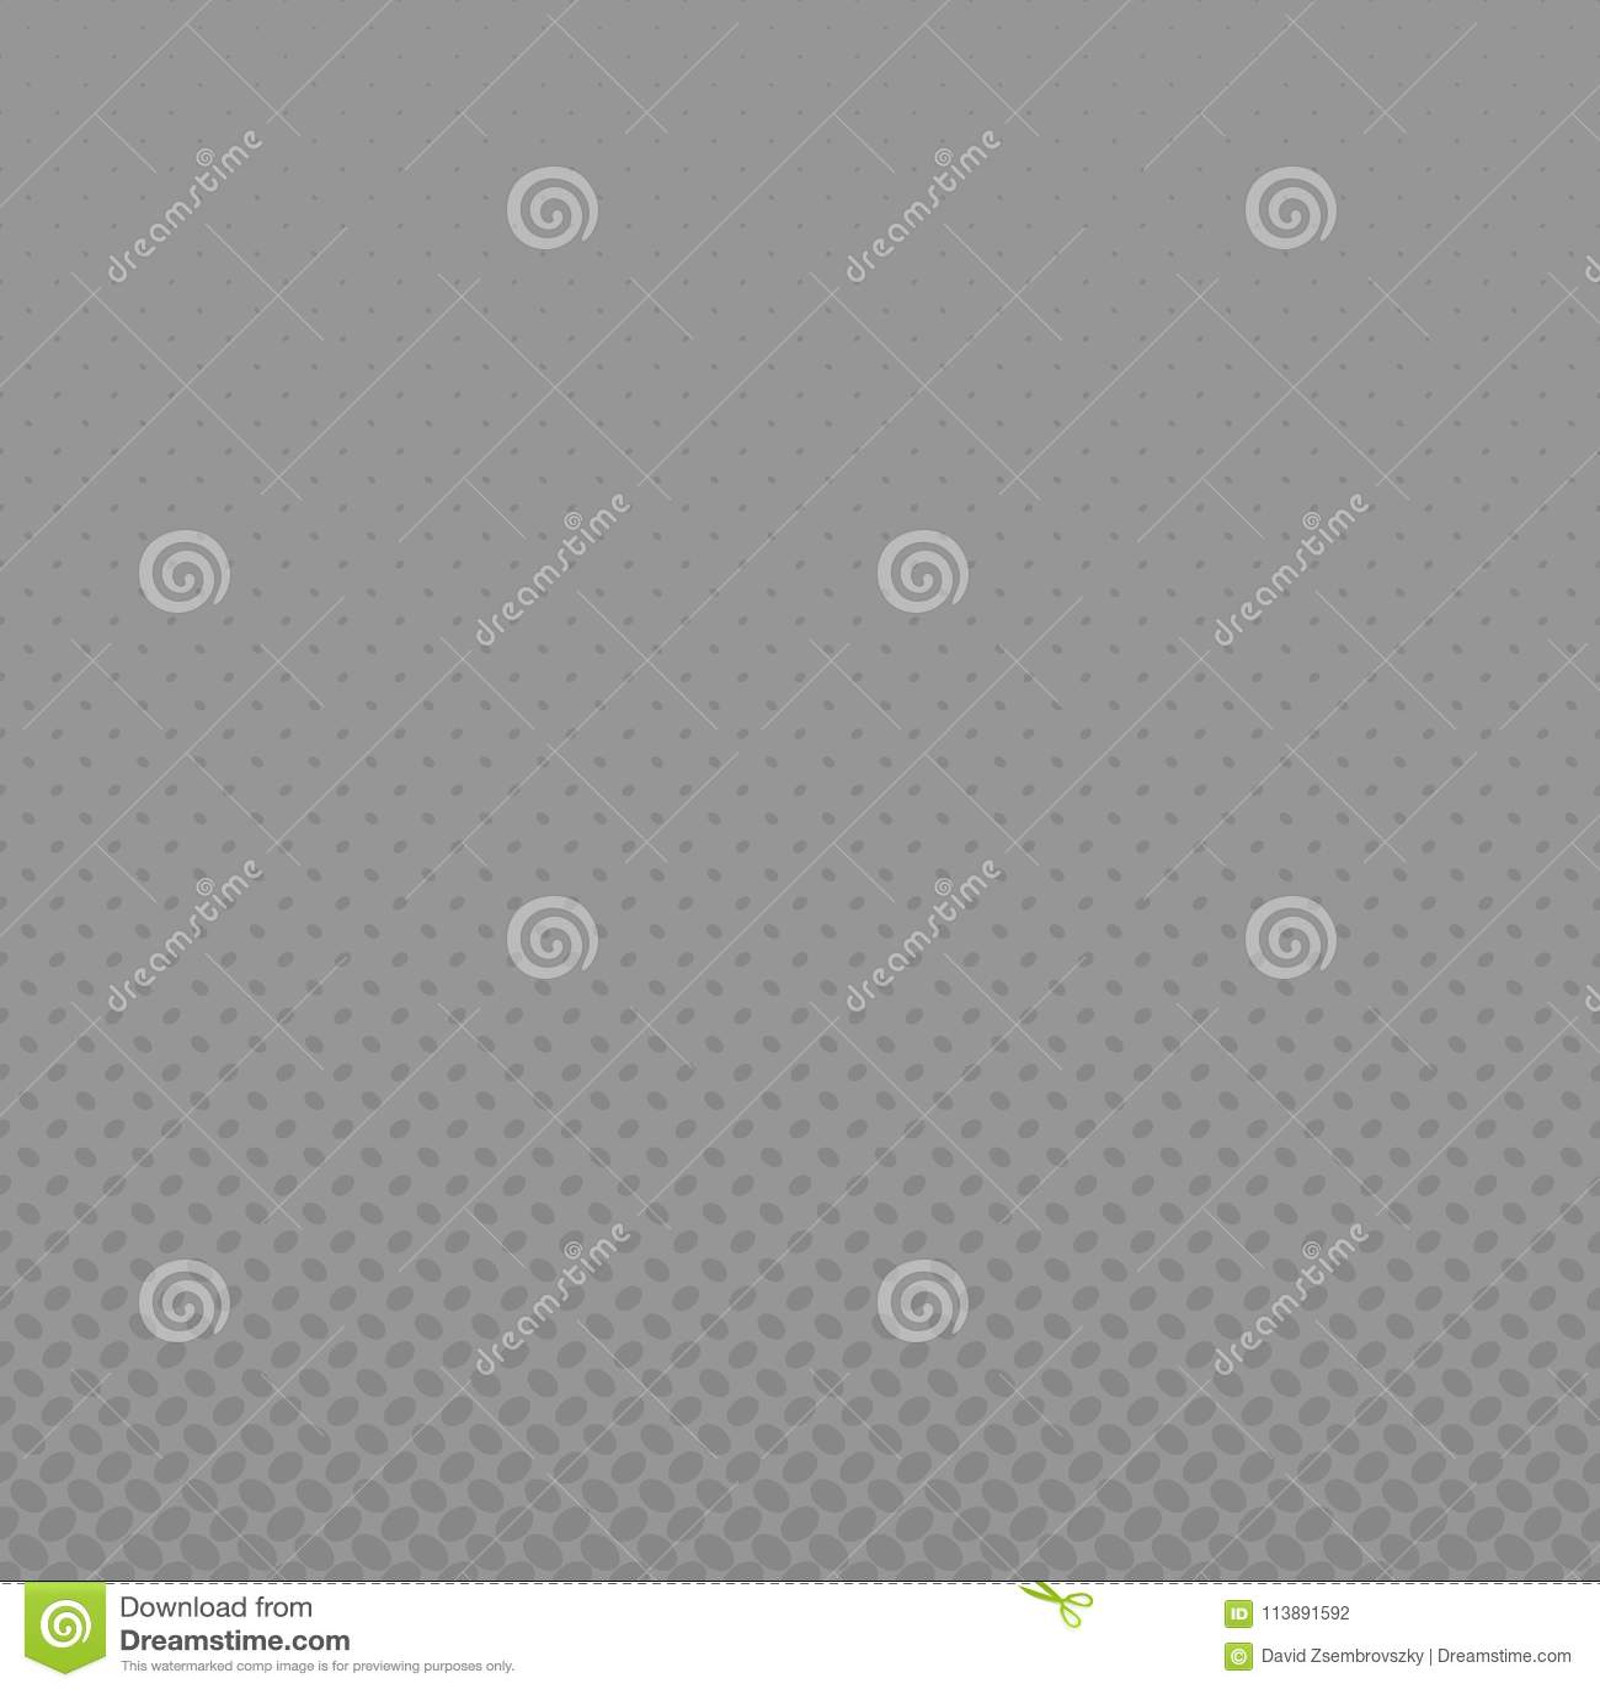 Grey Geometrical Halftone Ellipse Pattern Background Stock Vector ...